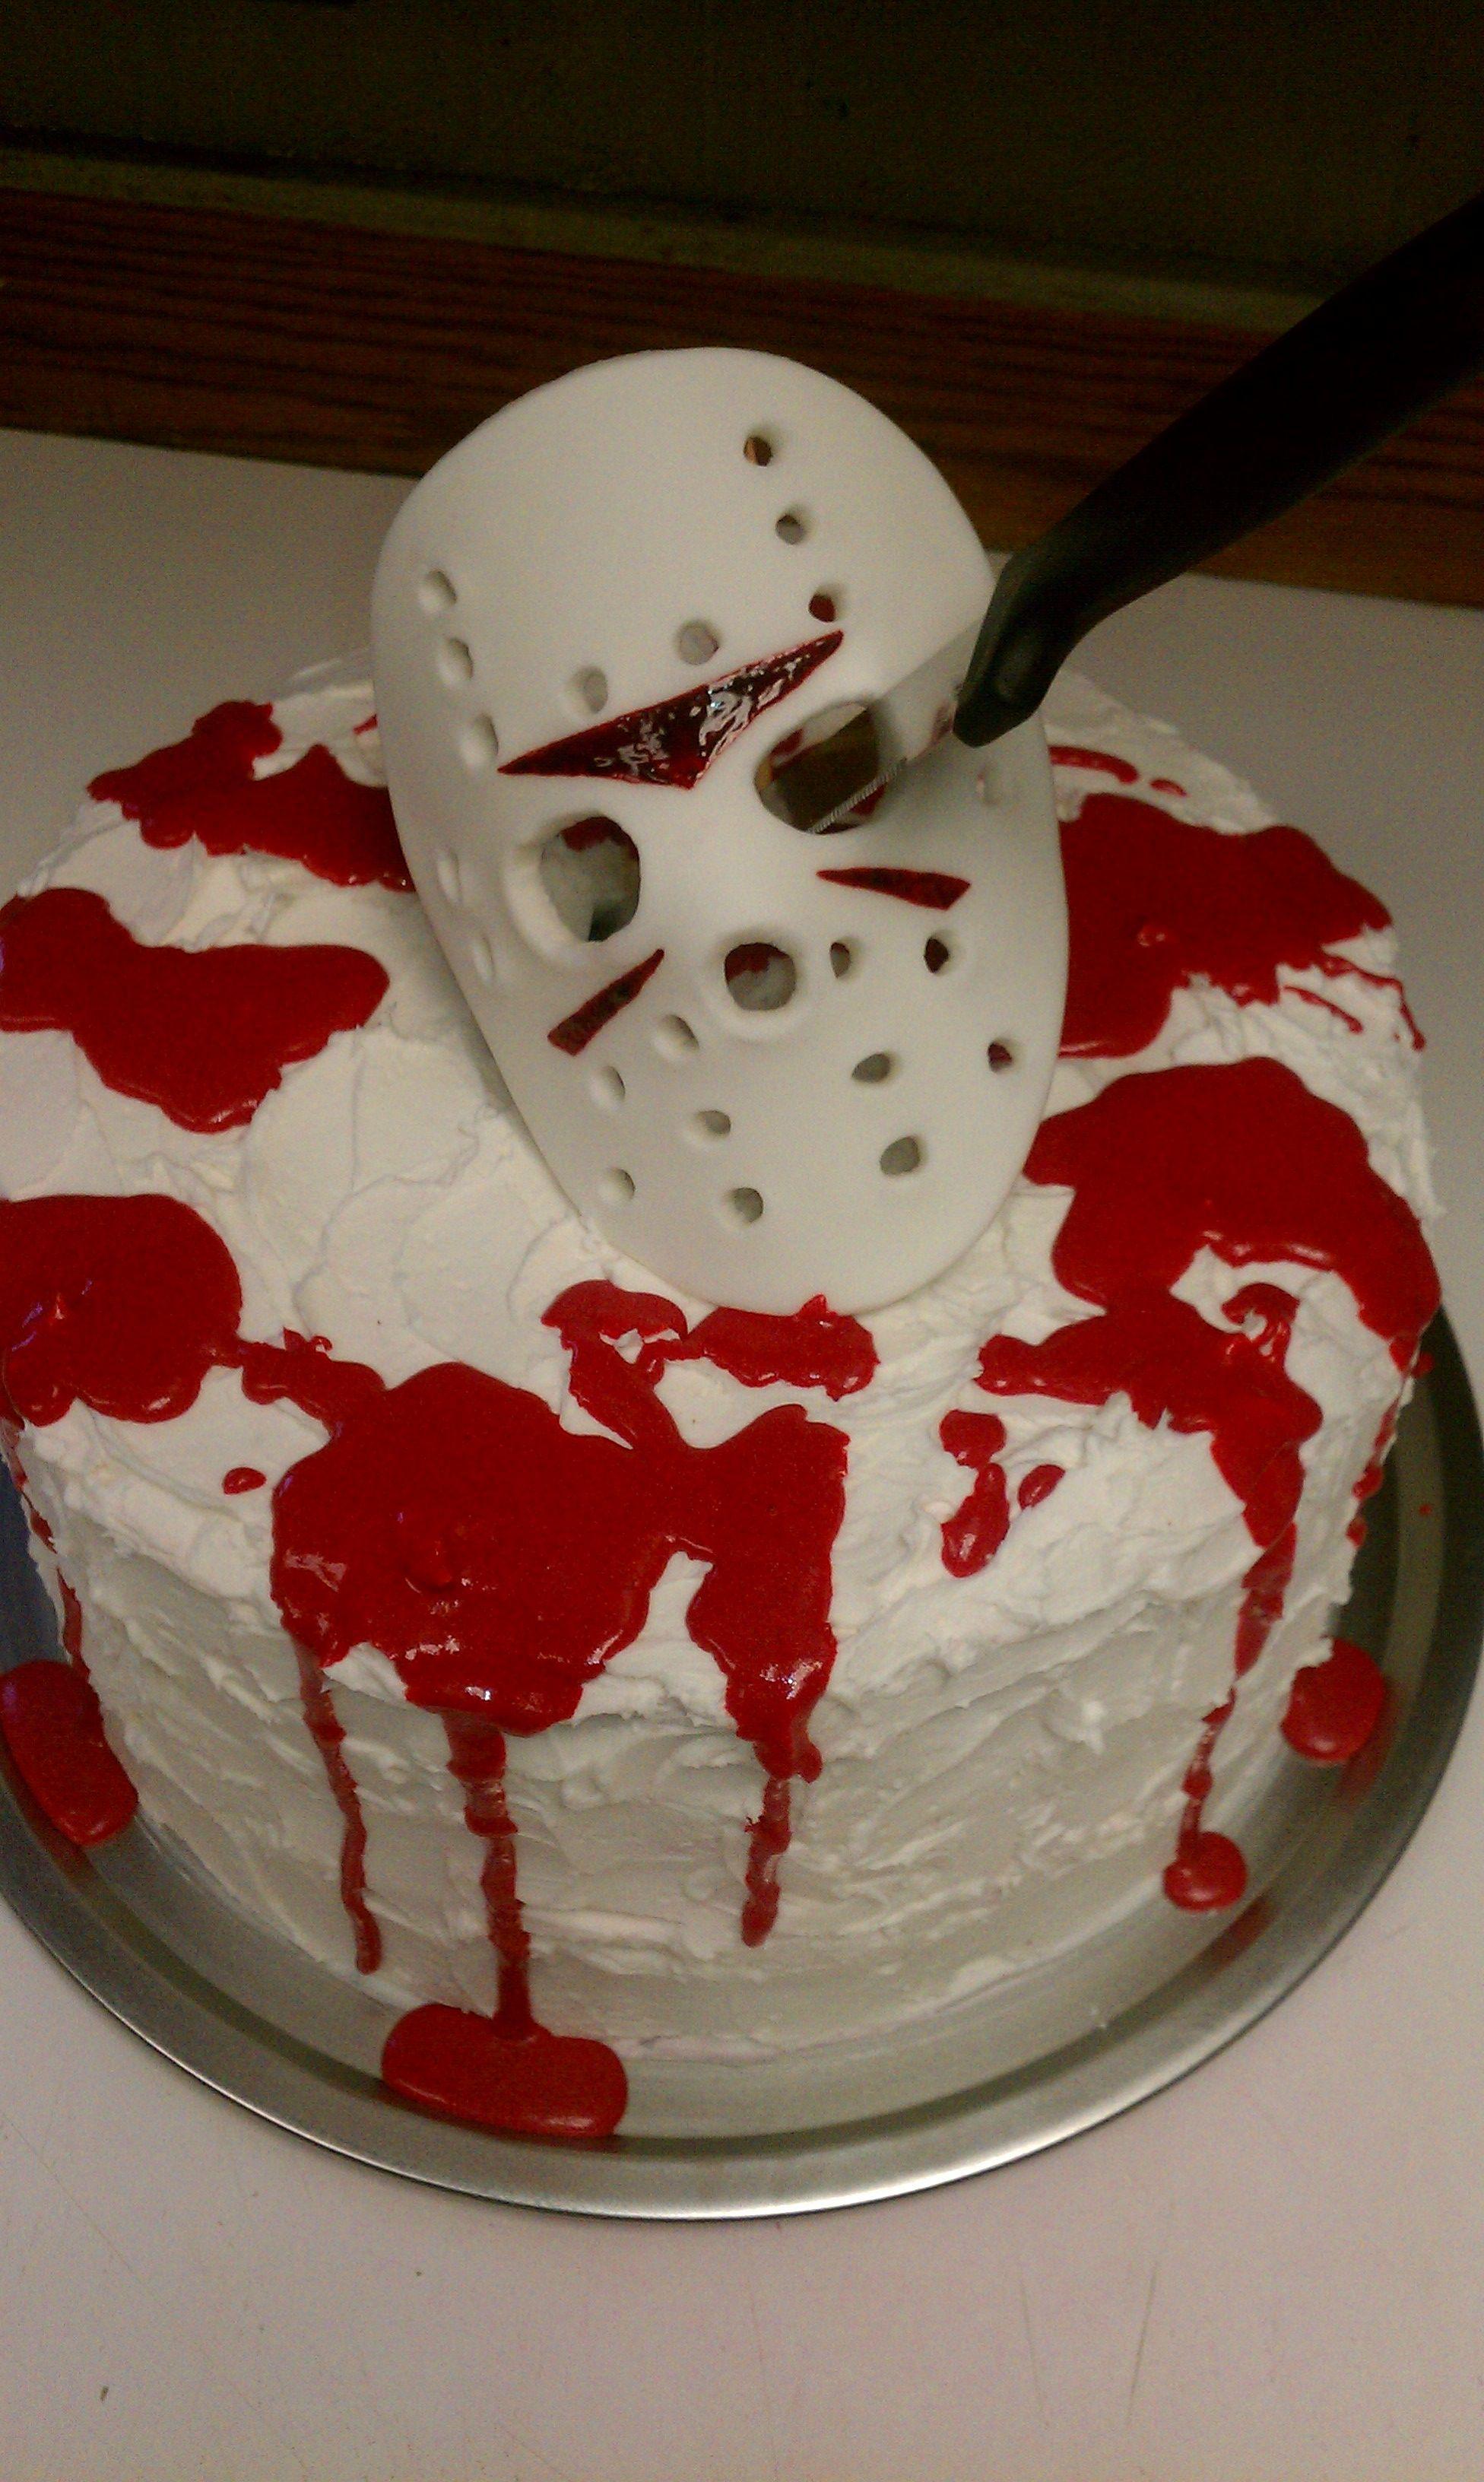 Tremendous Jason Voorhees Halloween Cake 3 Layer Red Velvet Cream Funny Birthday Cards Online Alyptdamsfinfo